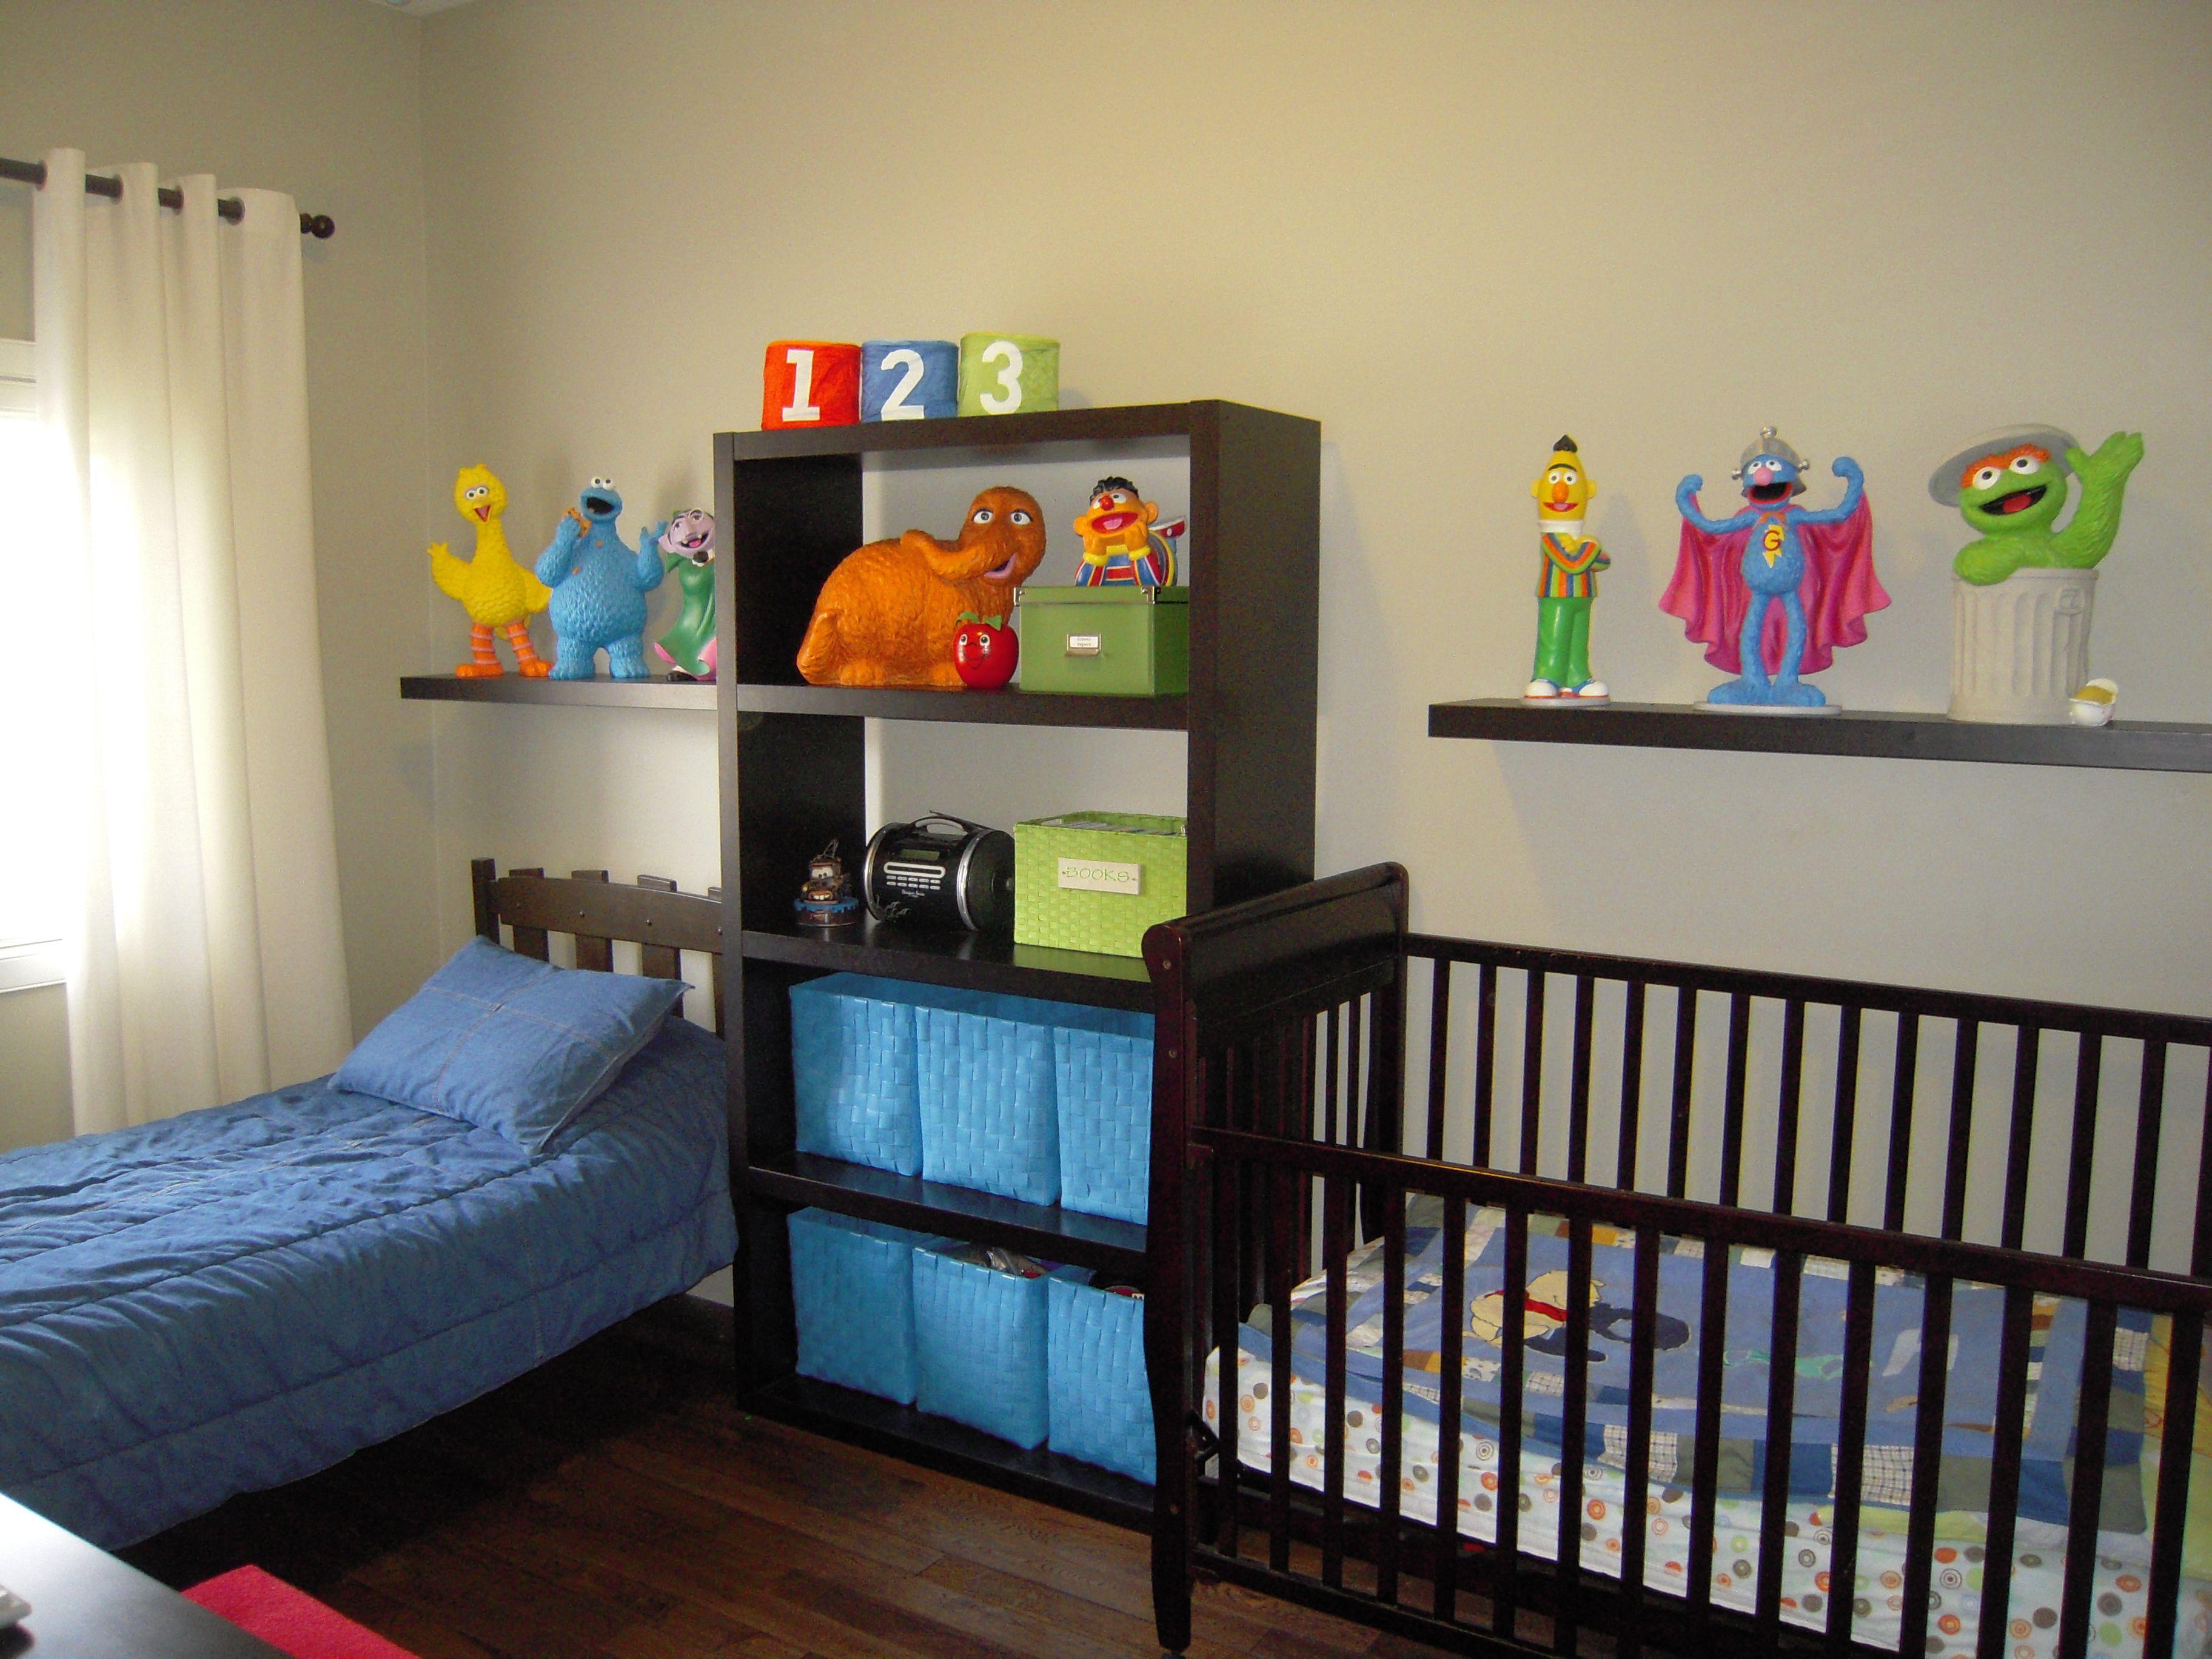 Pin By Coreen Wood On Home Decor Sesame Street Bedroom Sesame Street Room Toddler Room